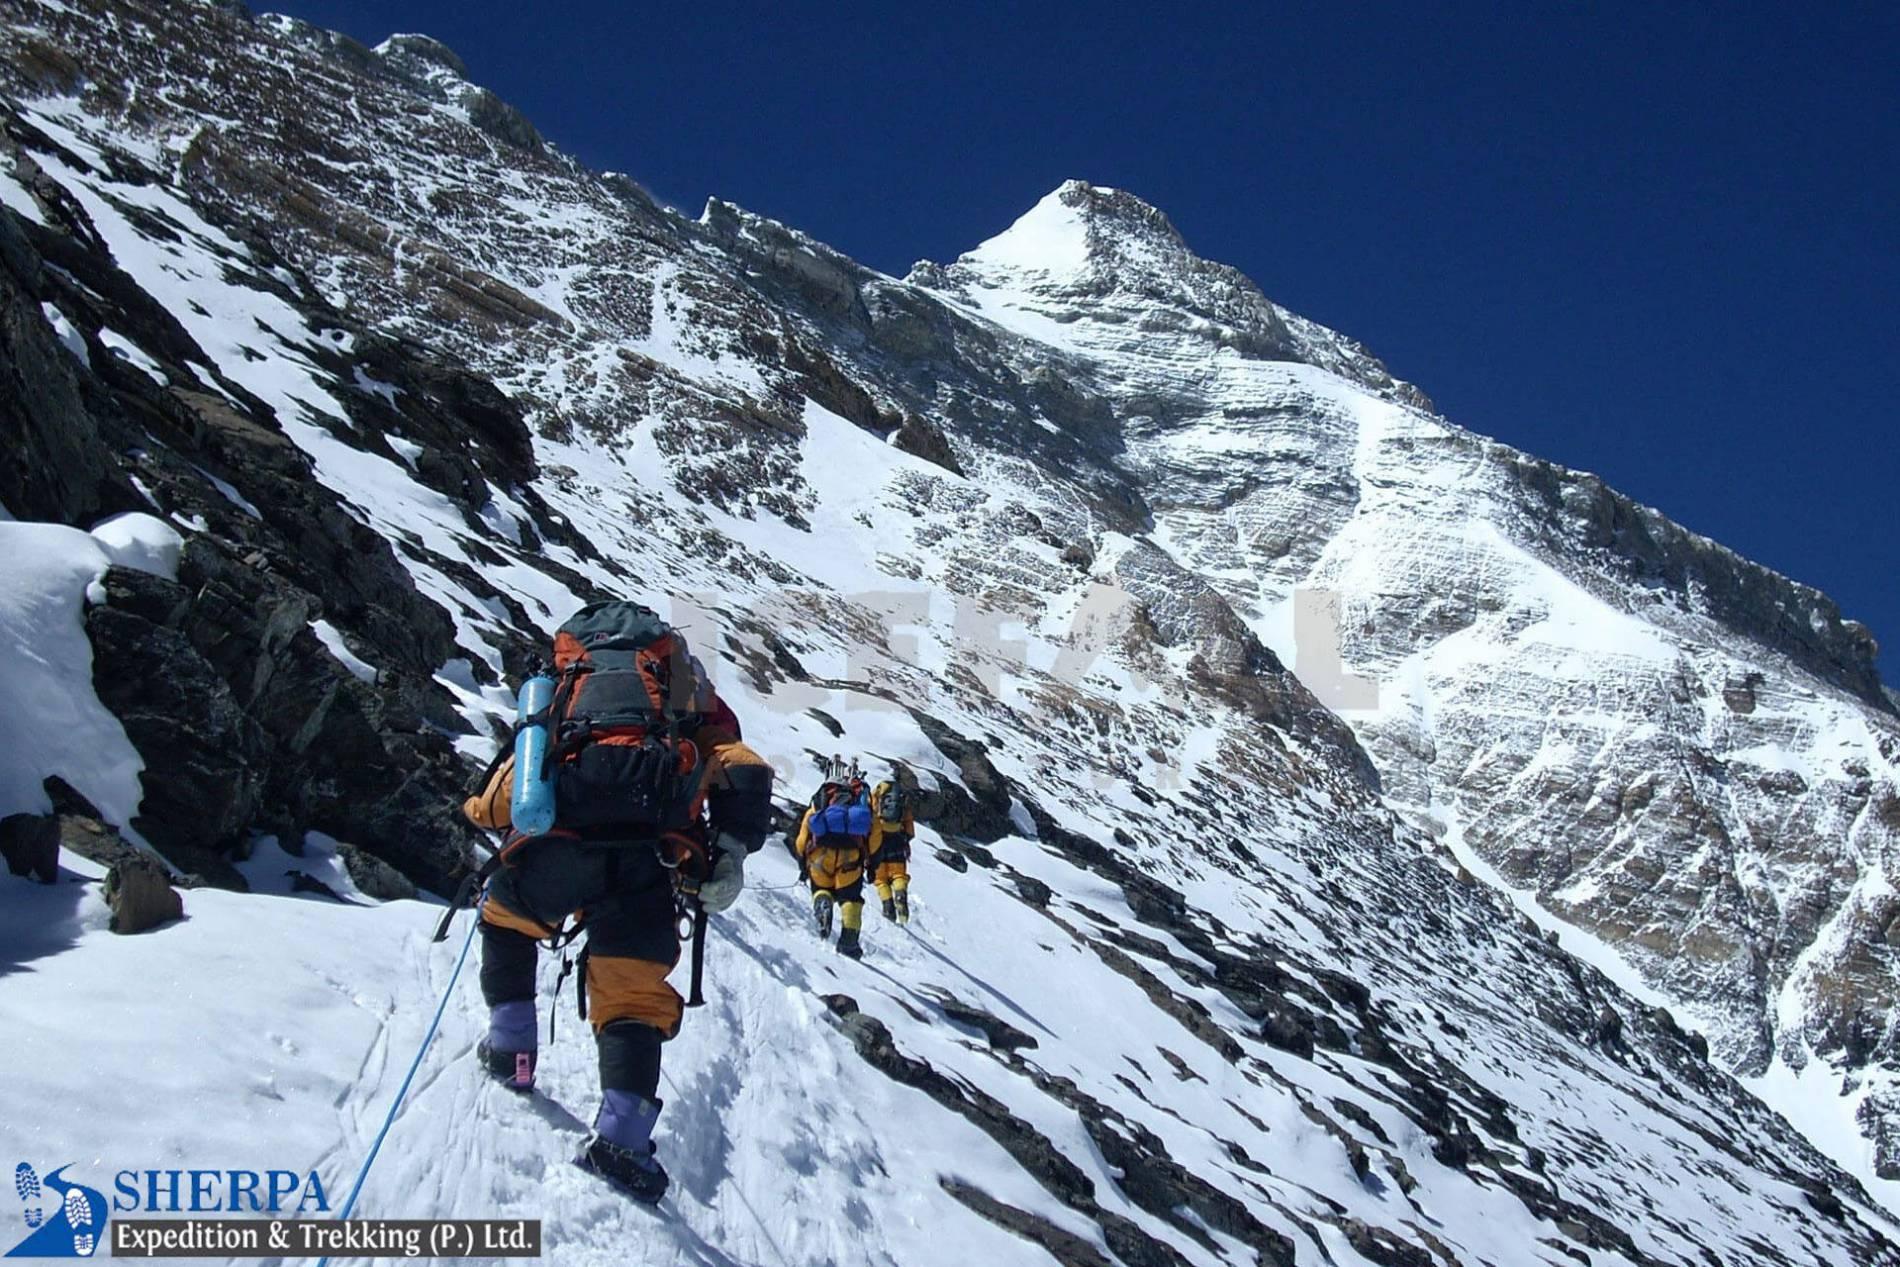 LOBUCHE PEAK CLIMBING 6,119 M/(20,075 FT)